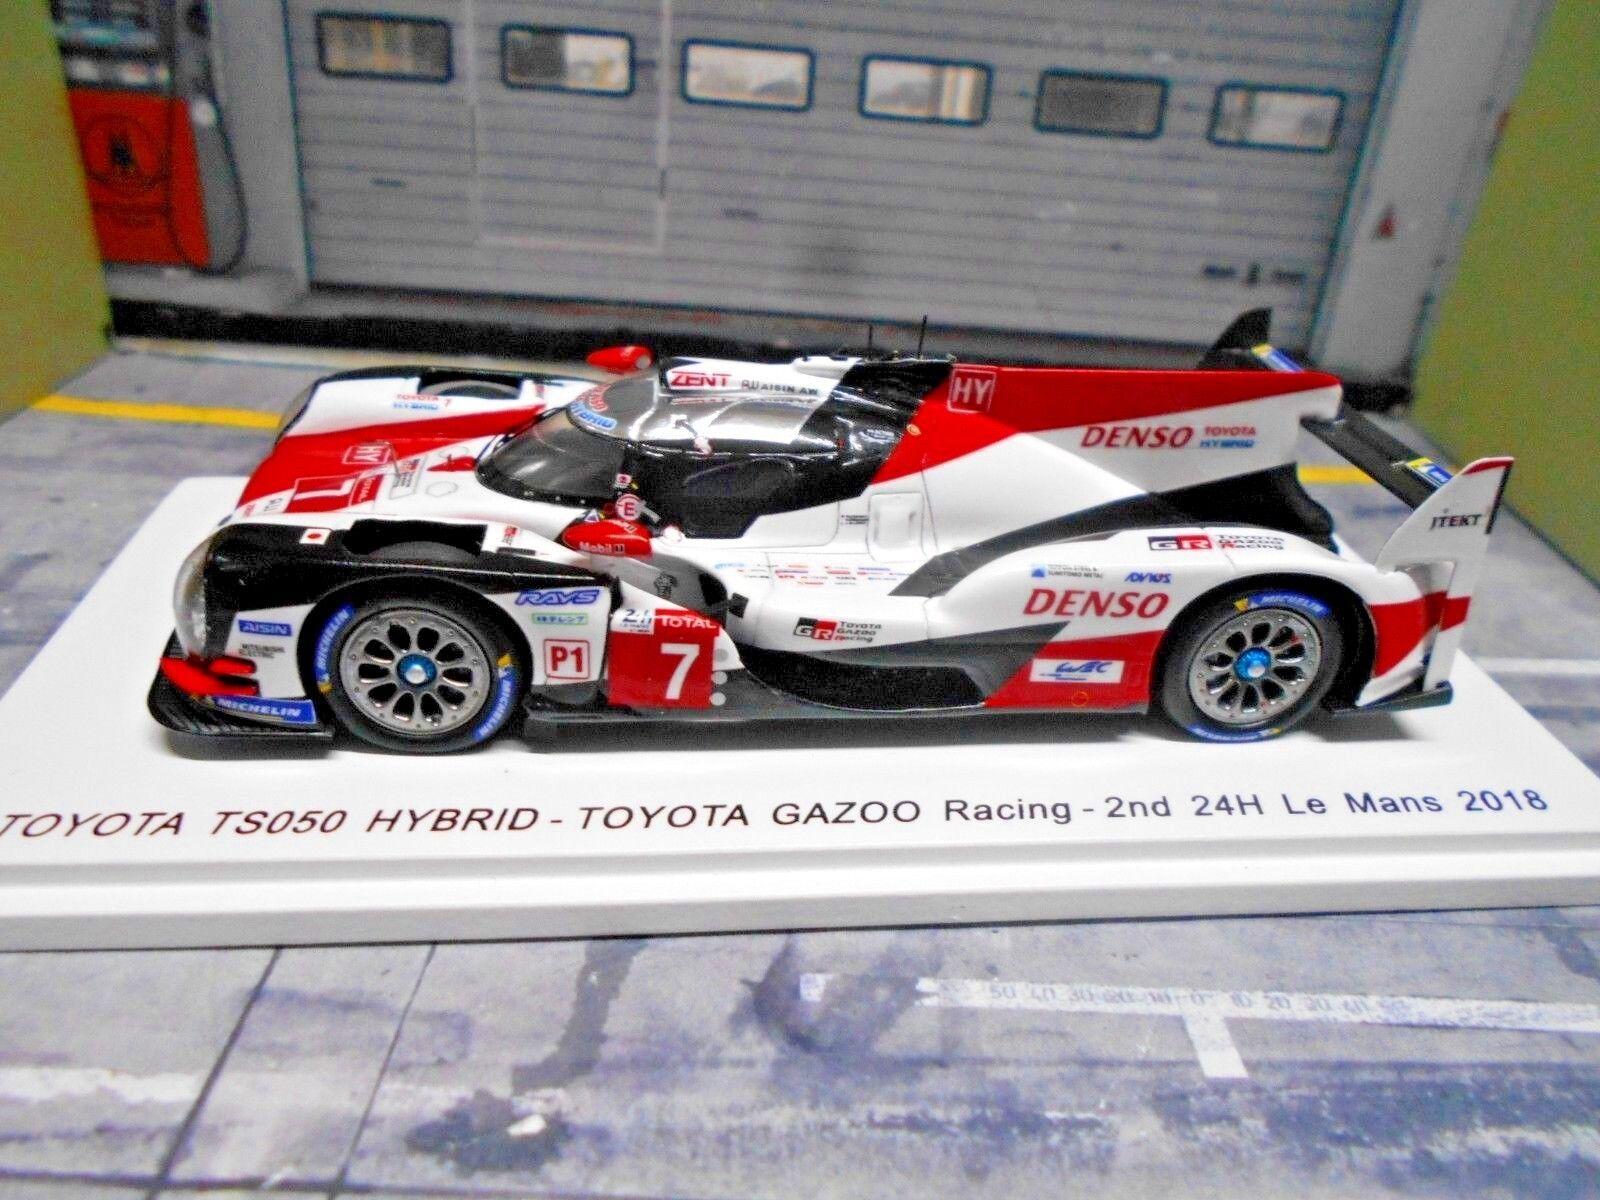 Toyota ts050 Hybride Gazoo Le Mans 2018  7 7 7 Conway Kobayashi Lopez Spark 1 43 88cc76